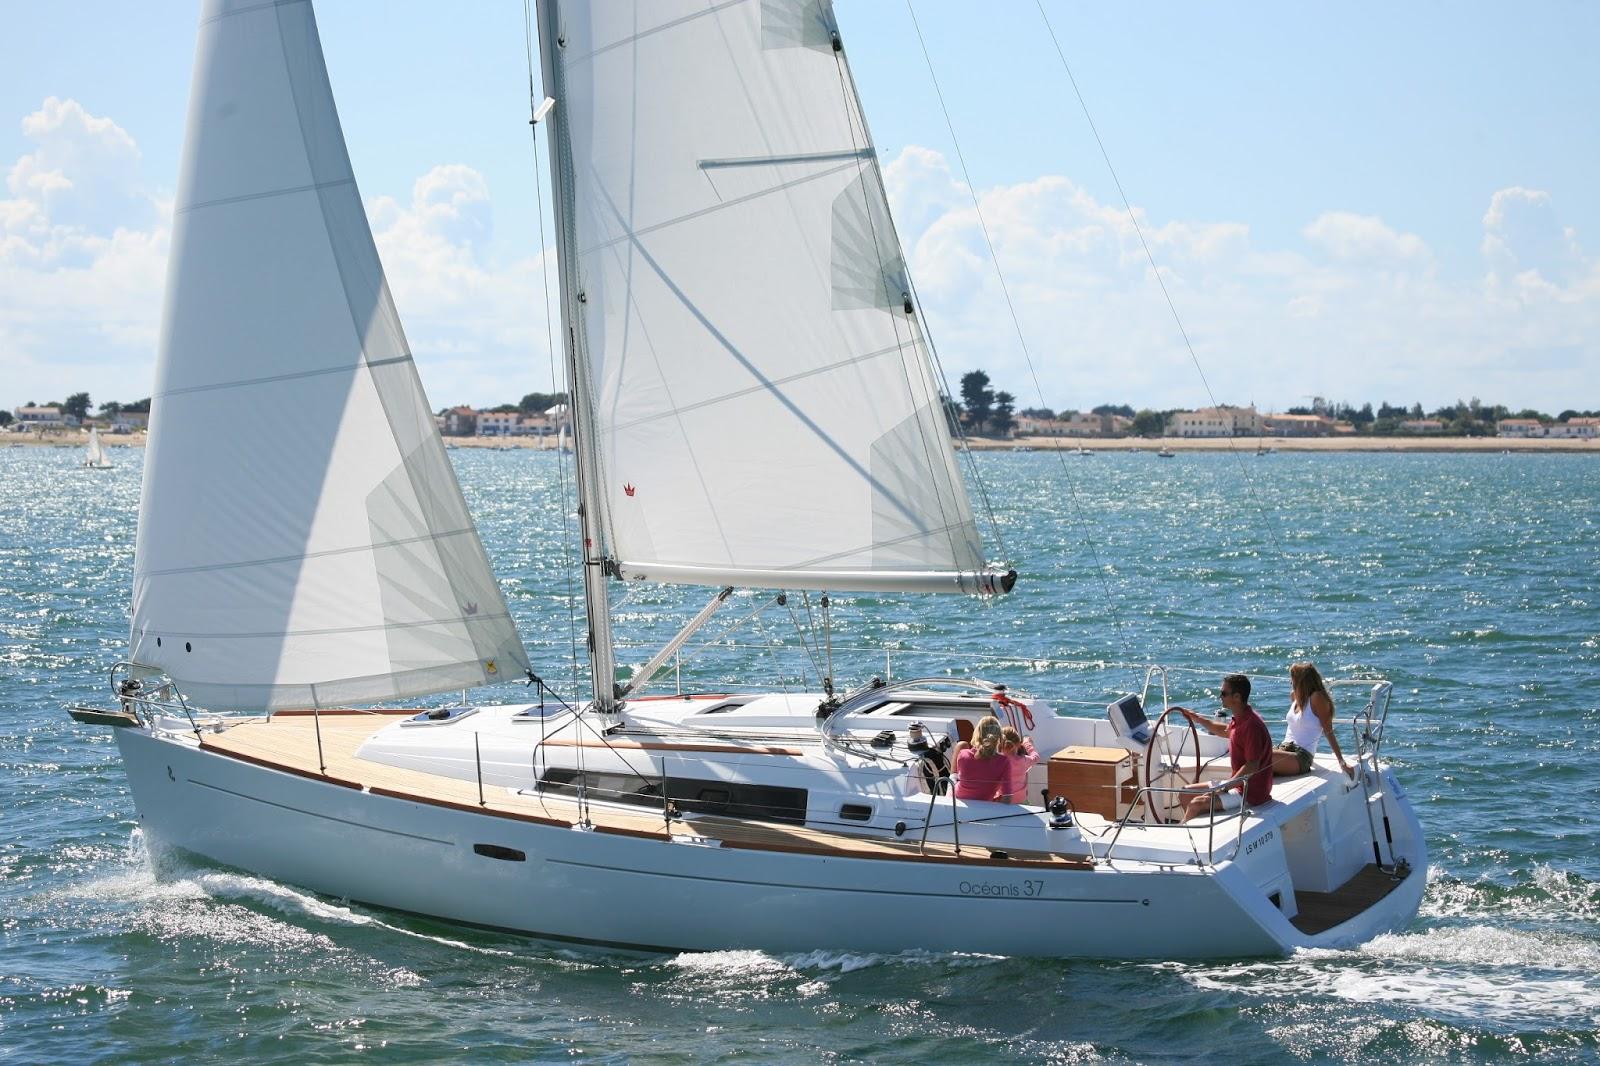 alquiler de veleros baratos en ibiza alquiler veleros baratos ibiza alquiler de barcos en